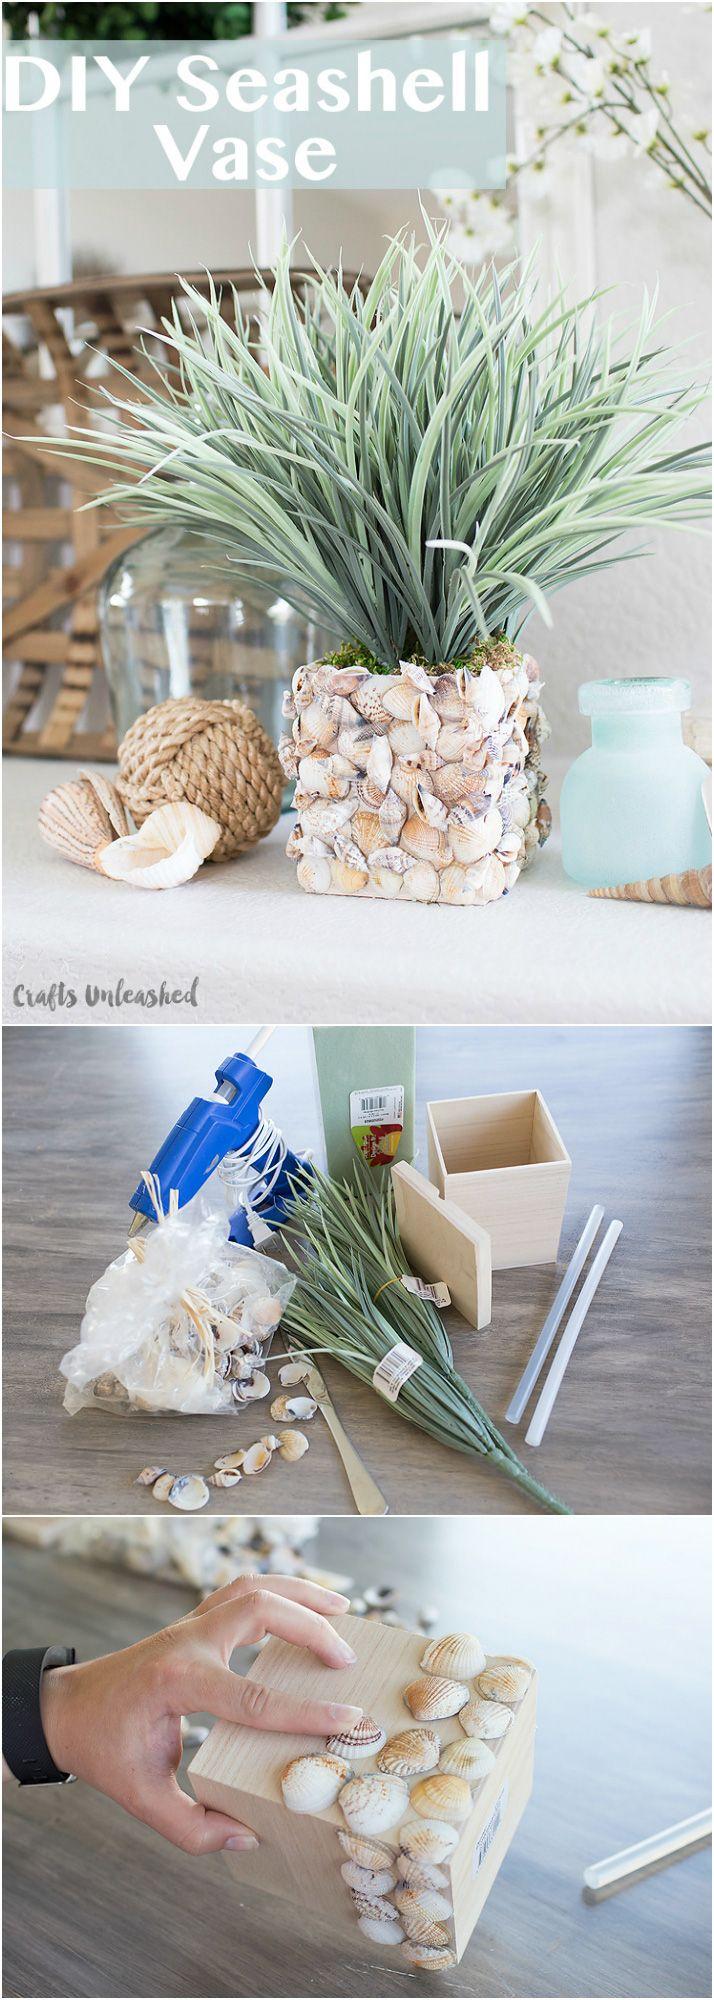 Shell diy make your own seashell vase consumer crafts shell beachy diy seashell vase reviewsmspy